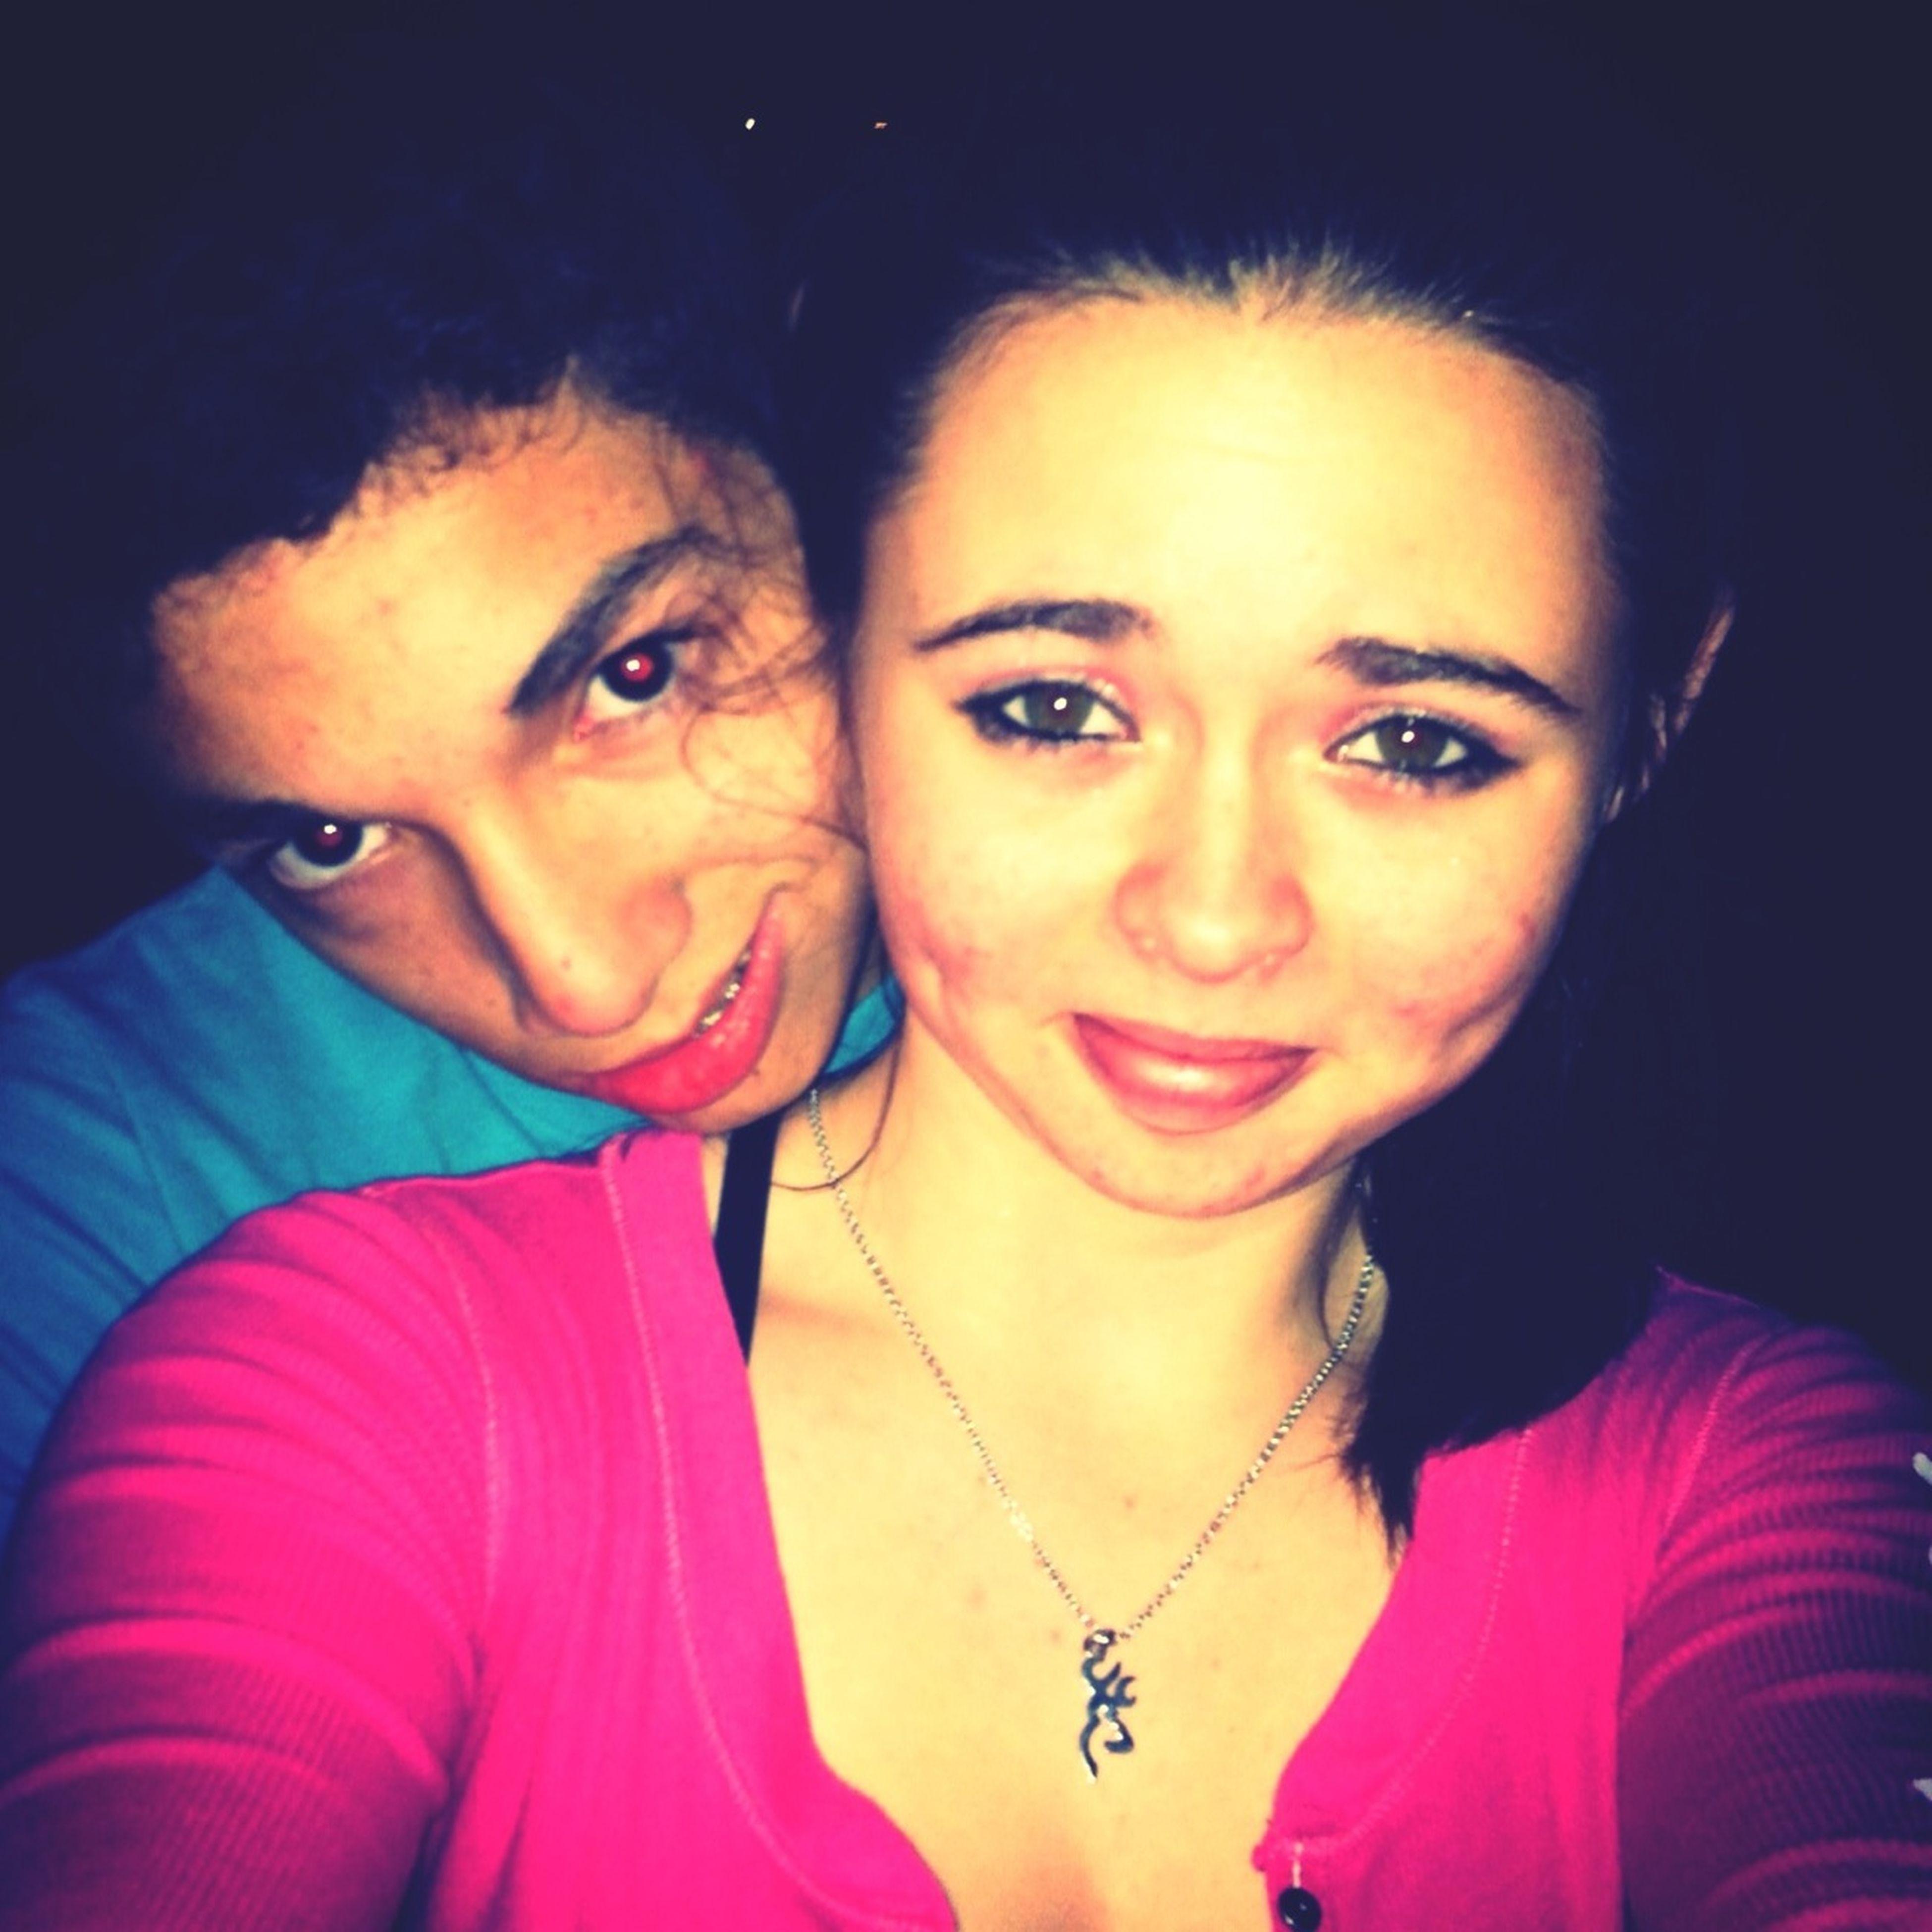 Me & Him<3